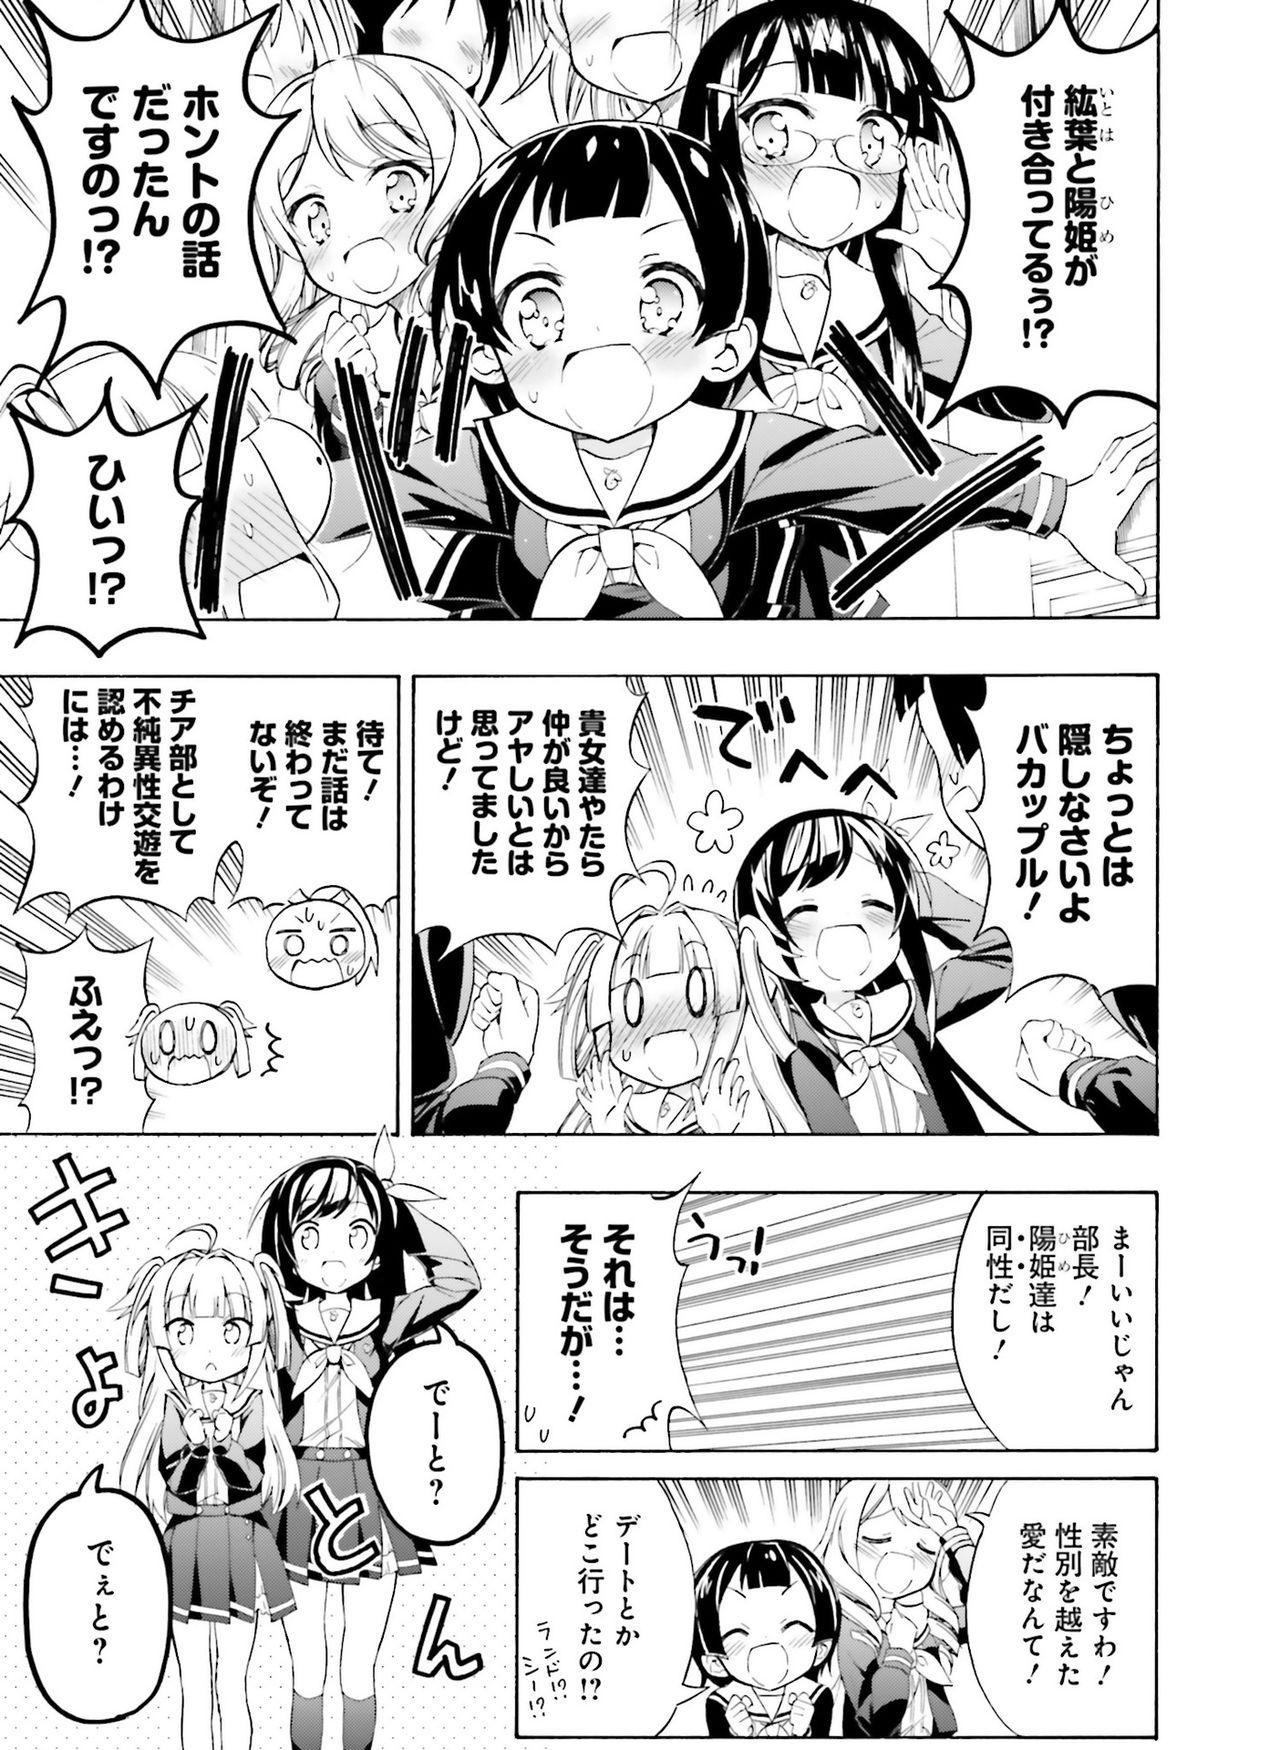 Dengeki Moeoh 2019-04 109